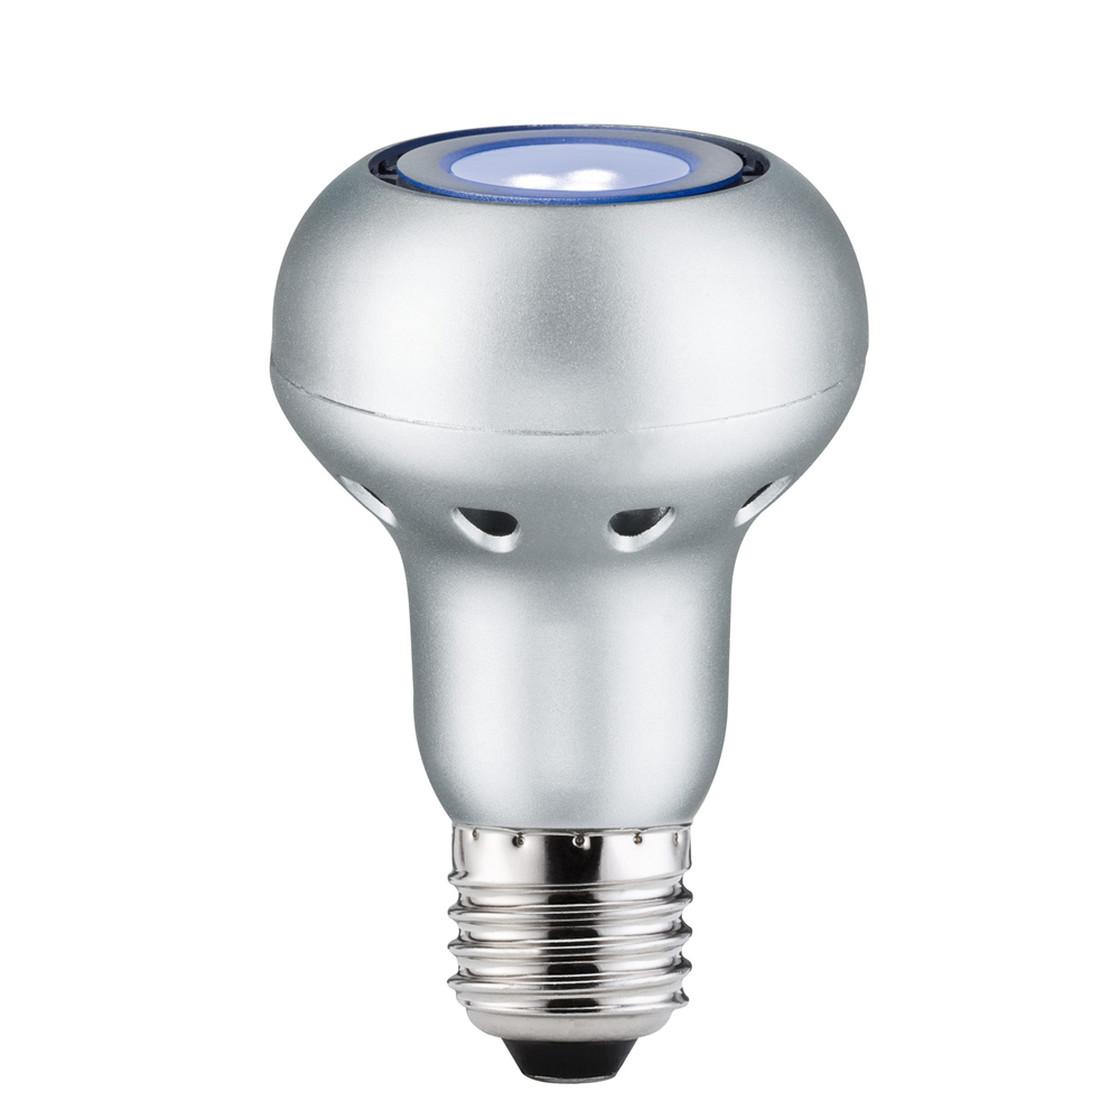 paulmann led reflektor 5w e27 r63 blacklight 3 99. Black Bedroom Furniture Sets. Home Design Ideas